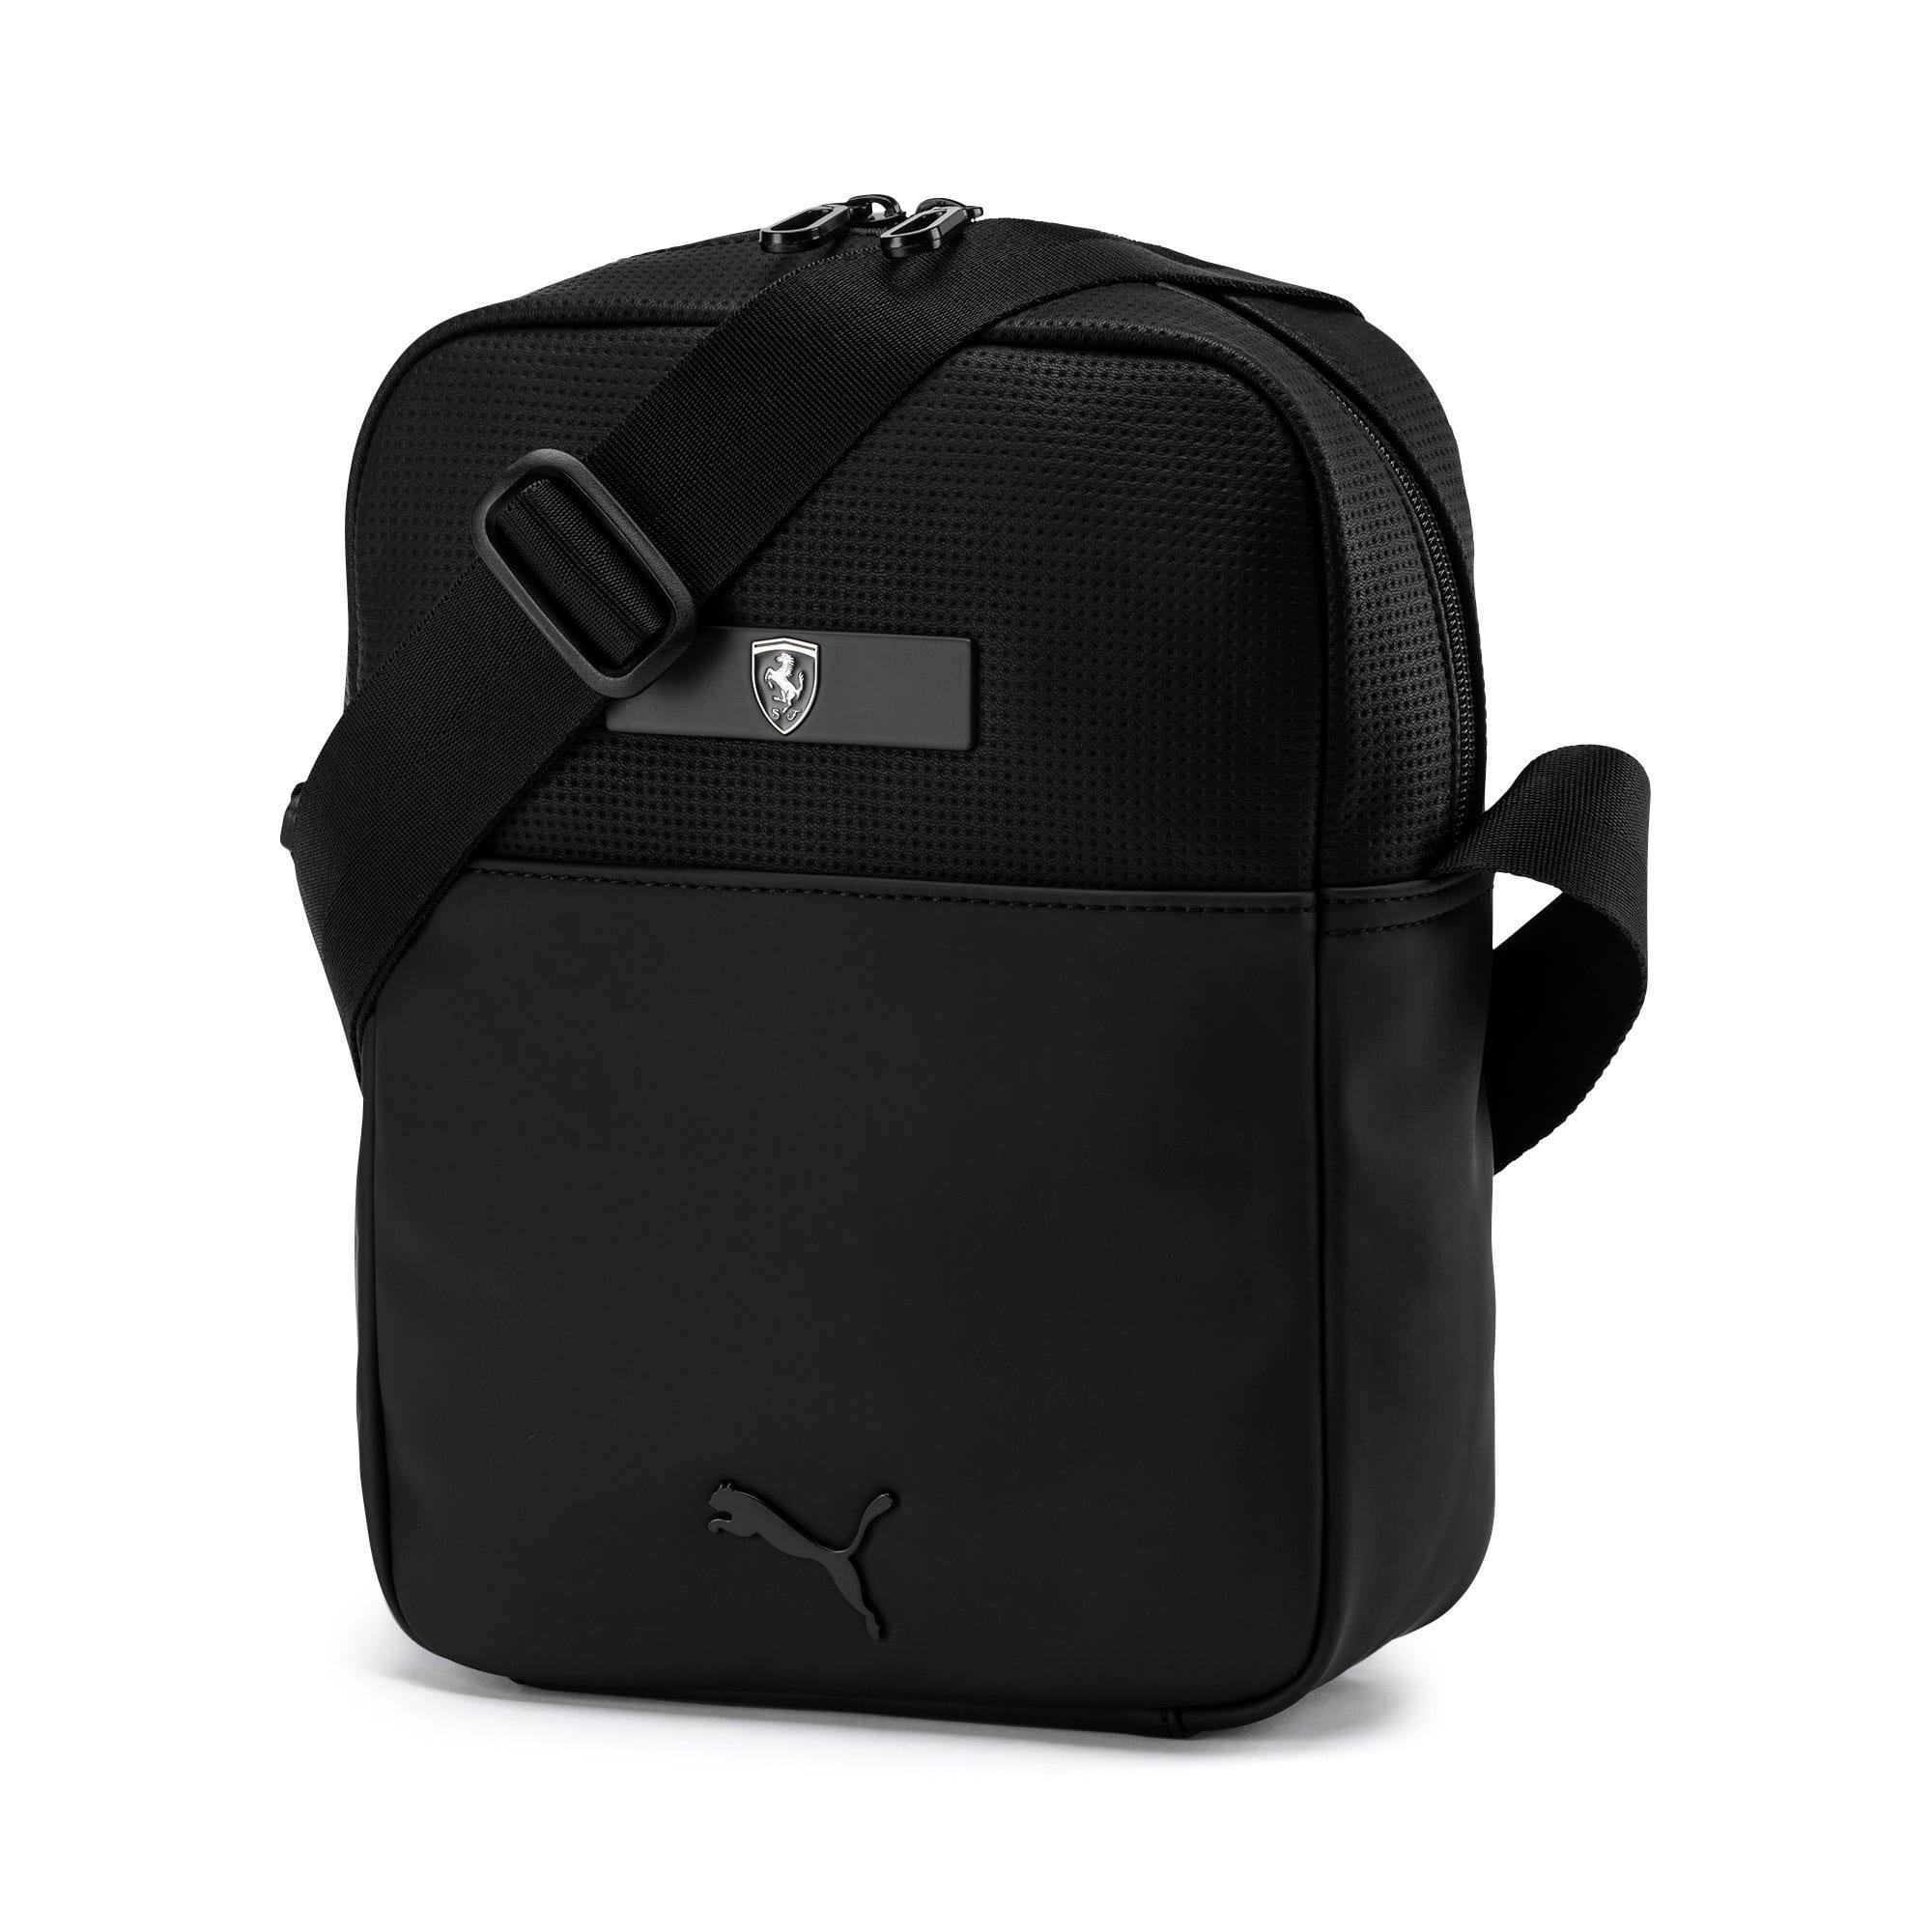 Thumbnail 1 of Scuderia Ferrari Lifestyle Large Portable Bag, Puma Black, medium